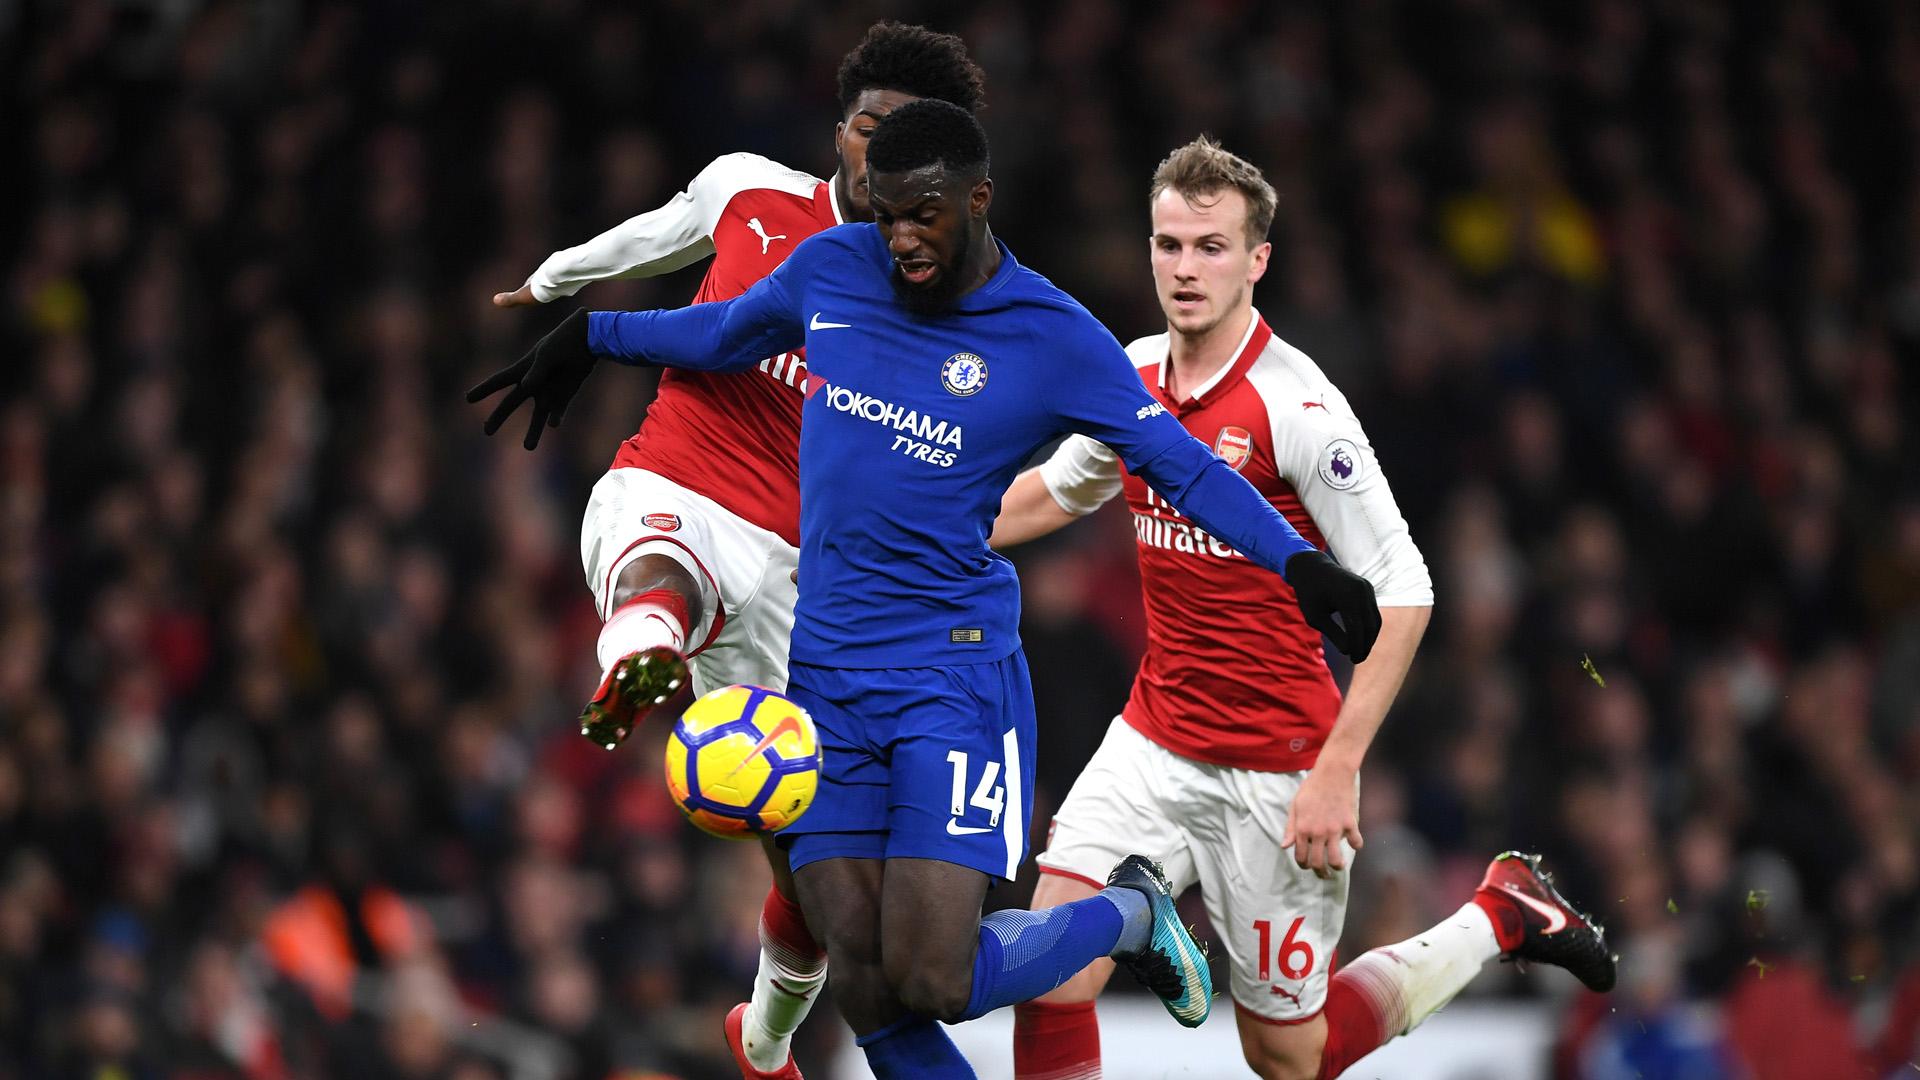 Tiemoue Bakayoko FC Chelsea 03012018